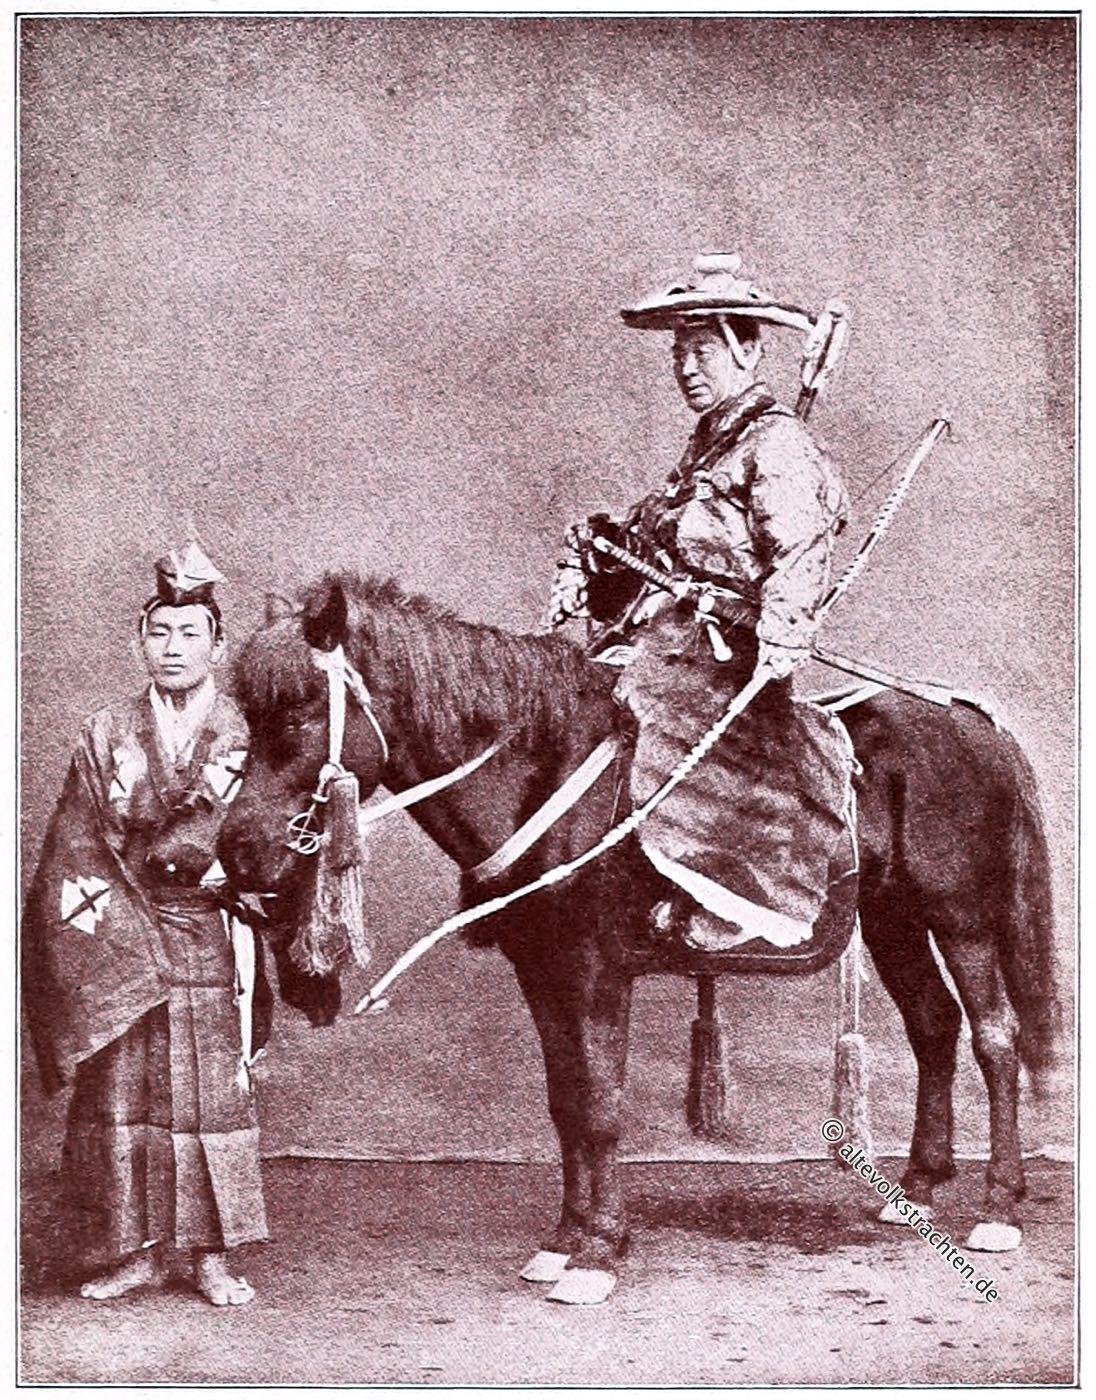 Samurai, Kamakura, Jagdkostüm, Samuraischwert, Kostüm, Japan, Captain F. Brinkley, Kazuma Ogawa